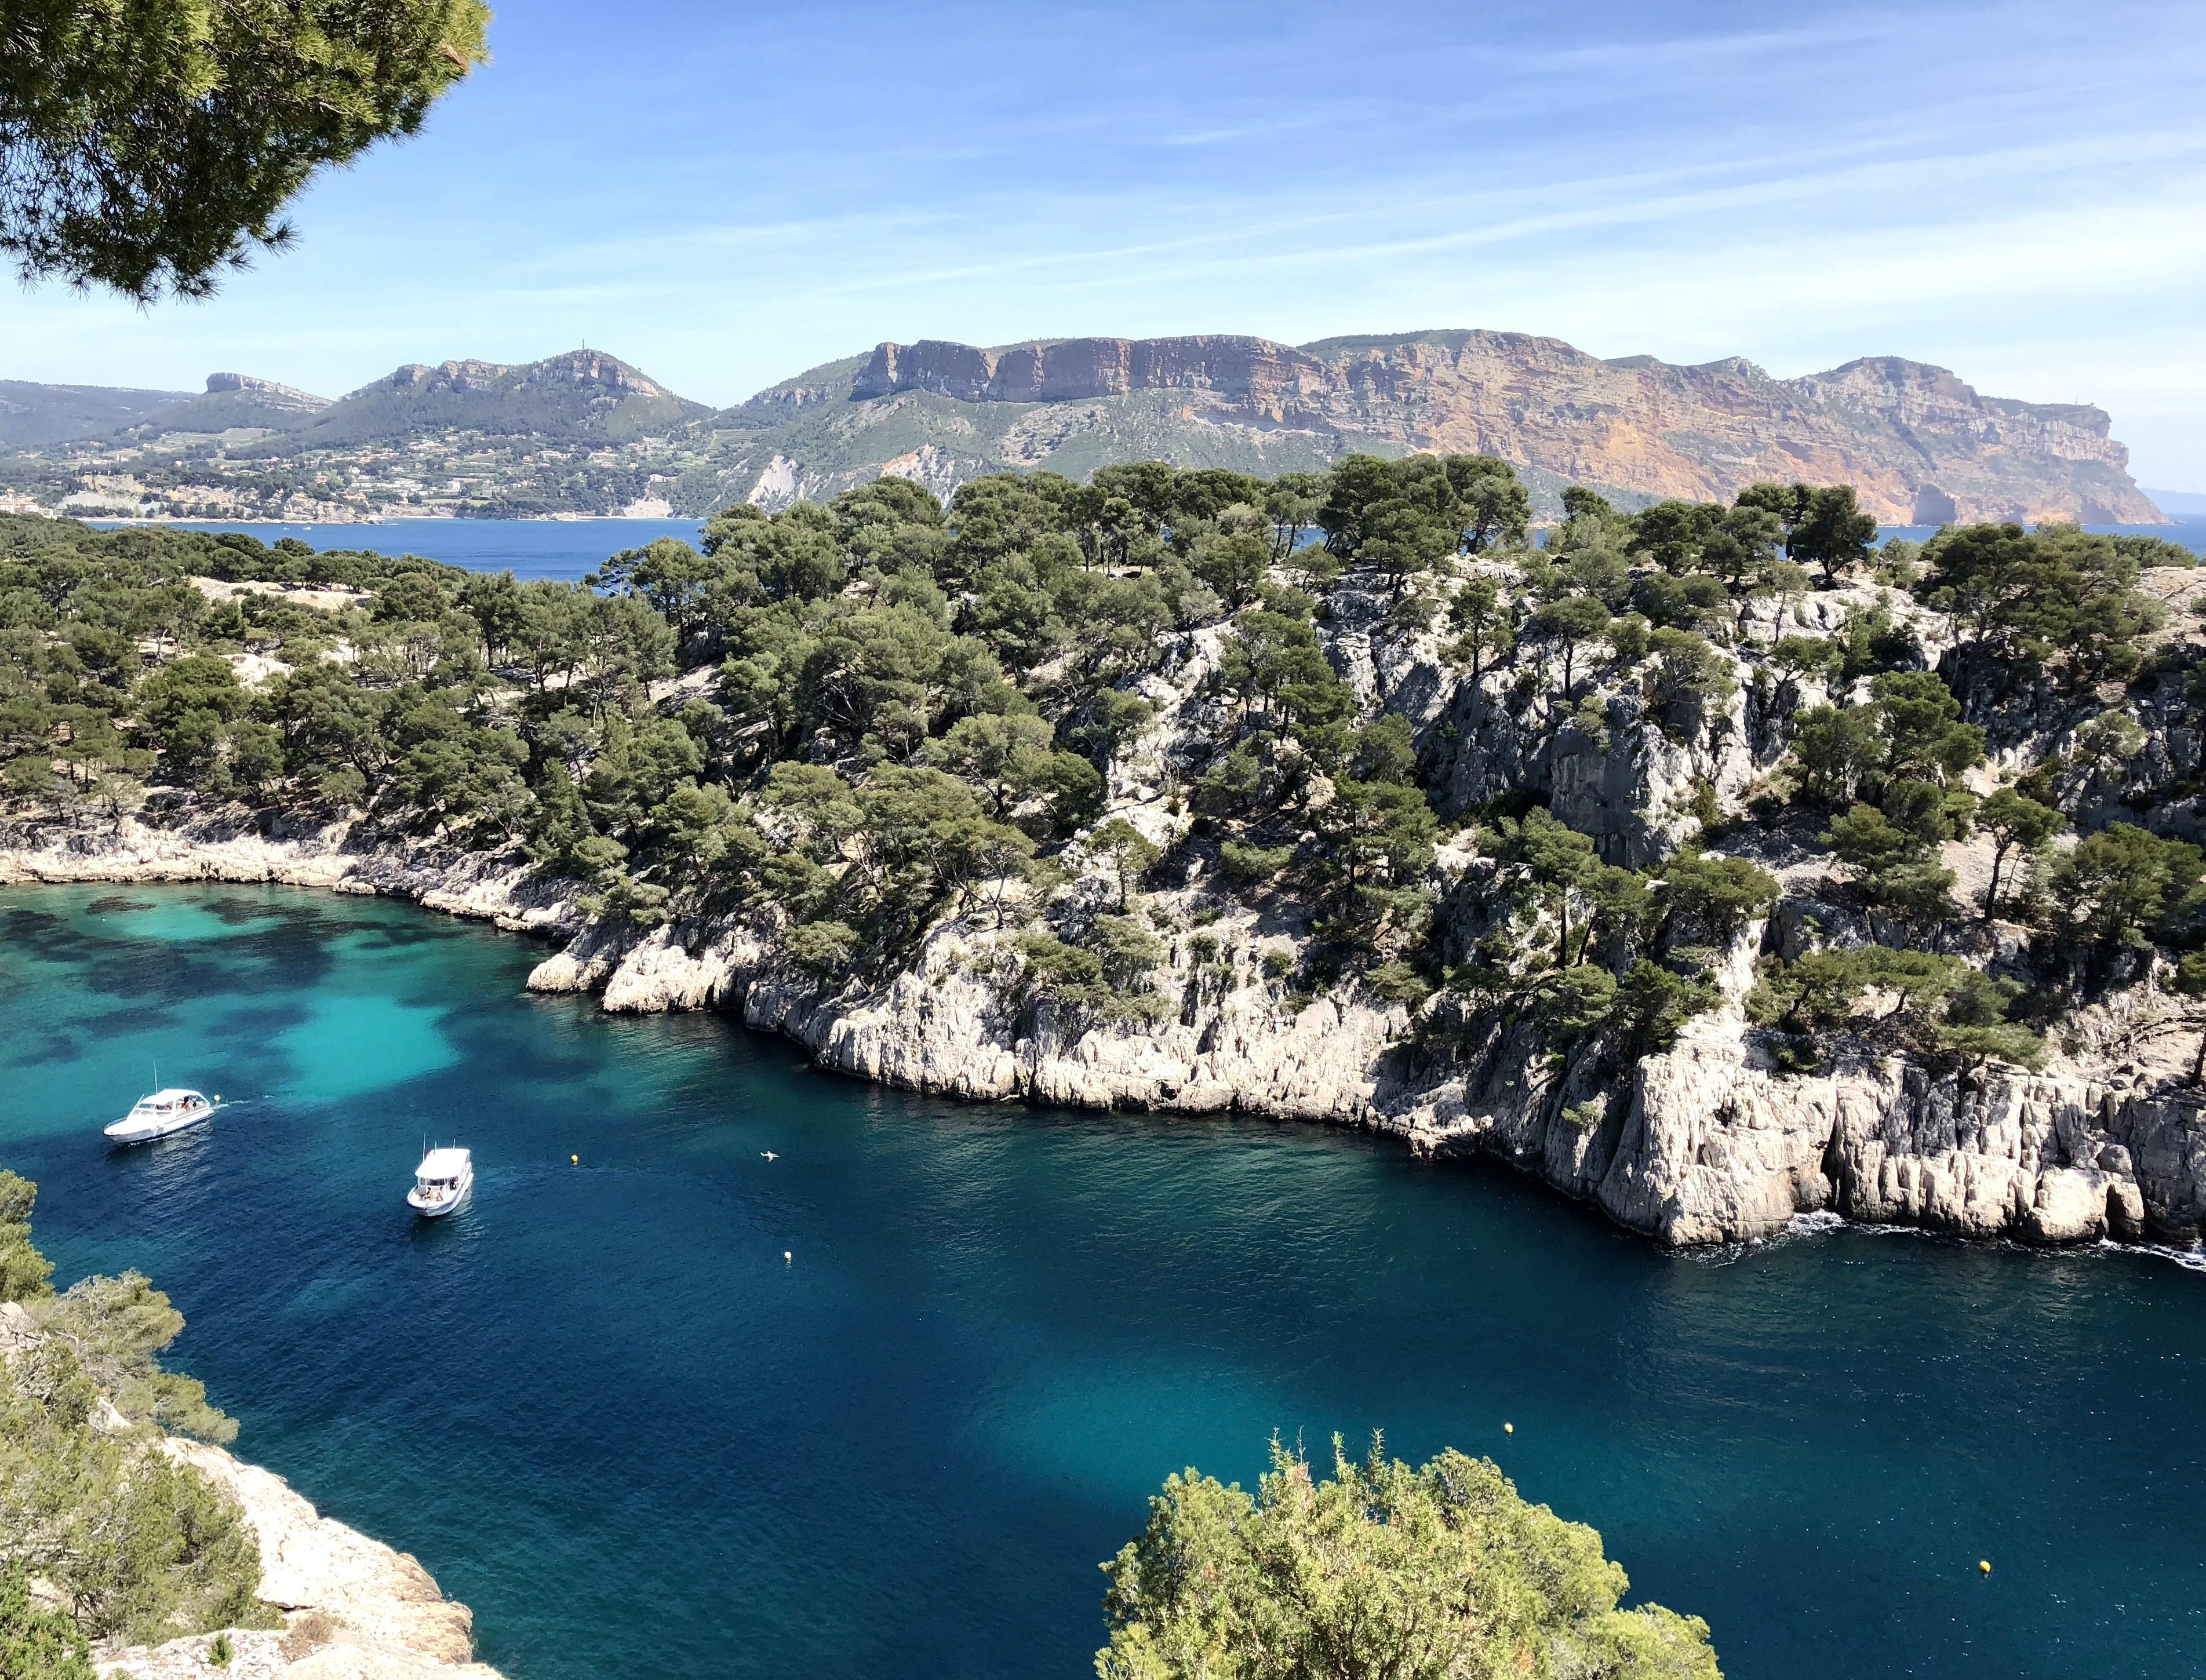 Visiter La calanque de Port-Miou, Provence - A faire, à voir à La calanque  de Port-Miou - Les Covoyageurs